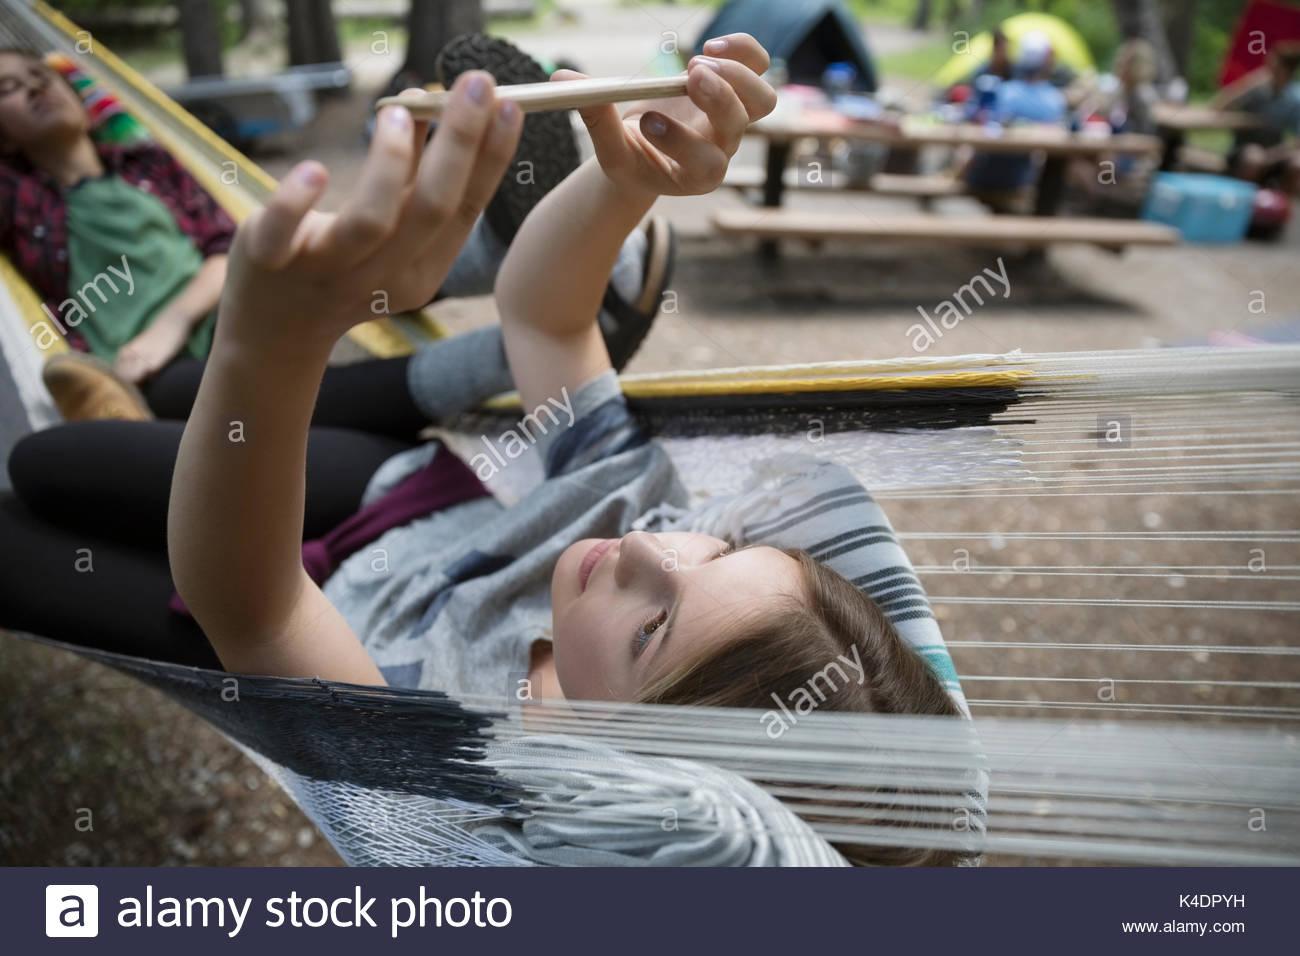 Teenage girl with camera phone taking selfie  in hammock at outdoor school campsite - Stock Image